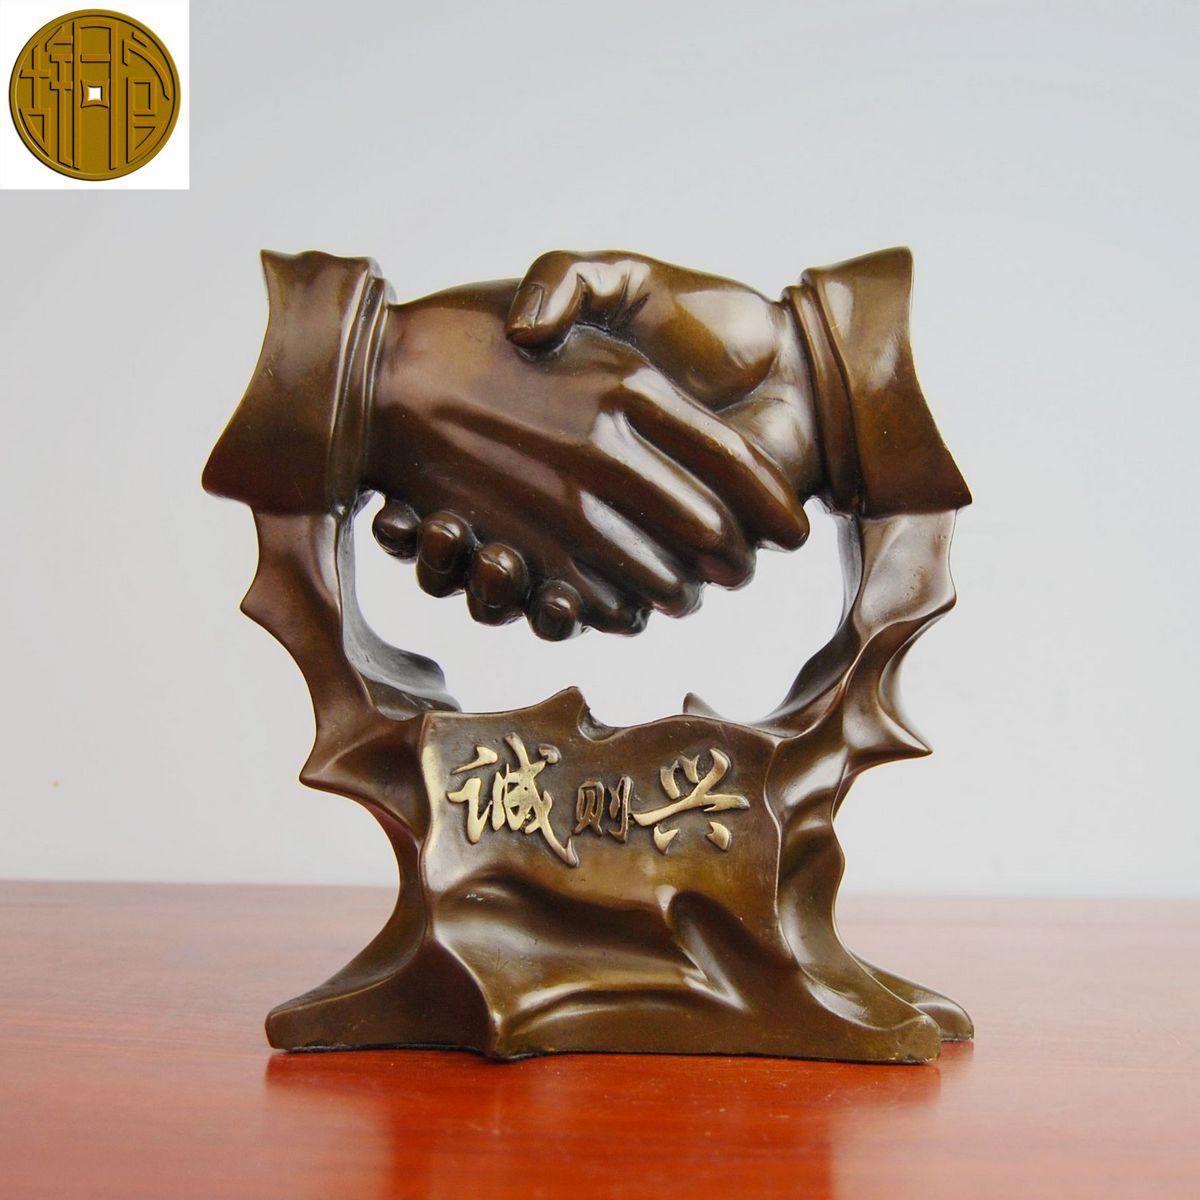 Old antique Bronze Arts & Crafts Bronze decoration desk opening gifts copper decoration crafts